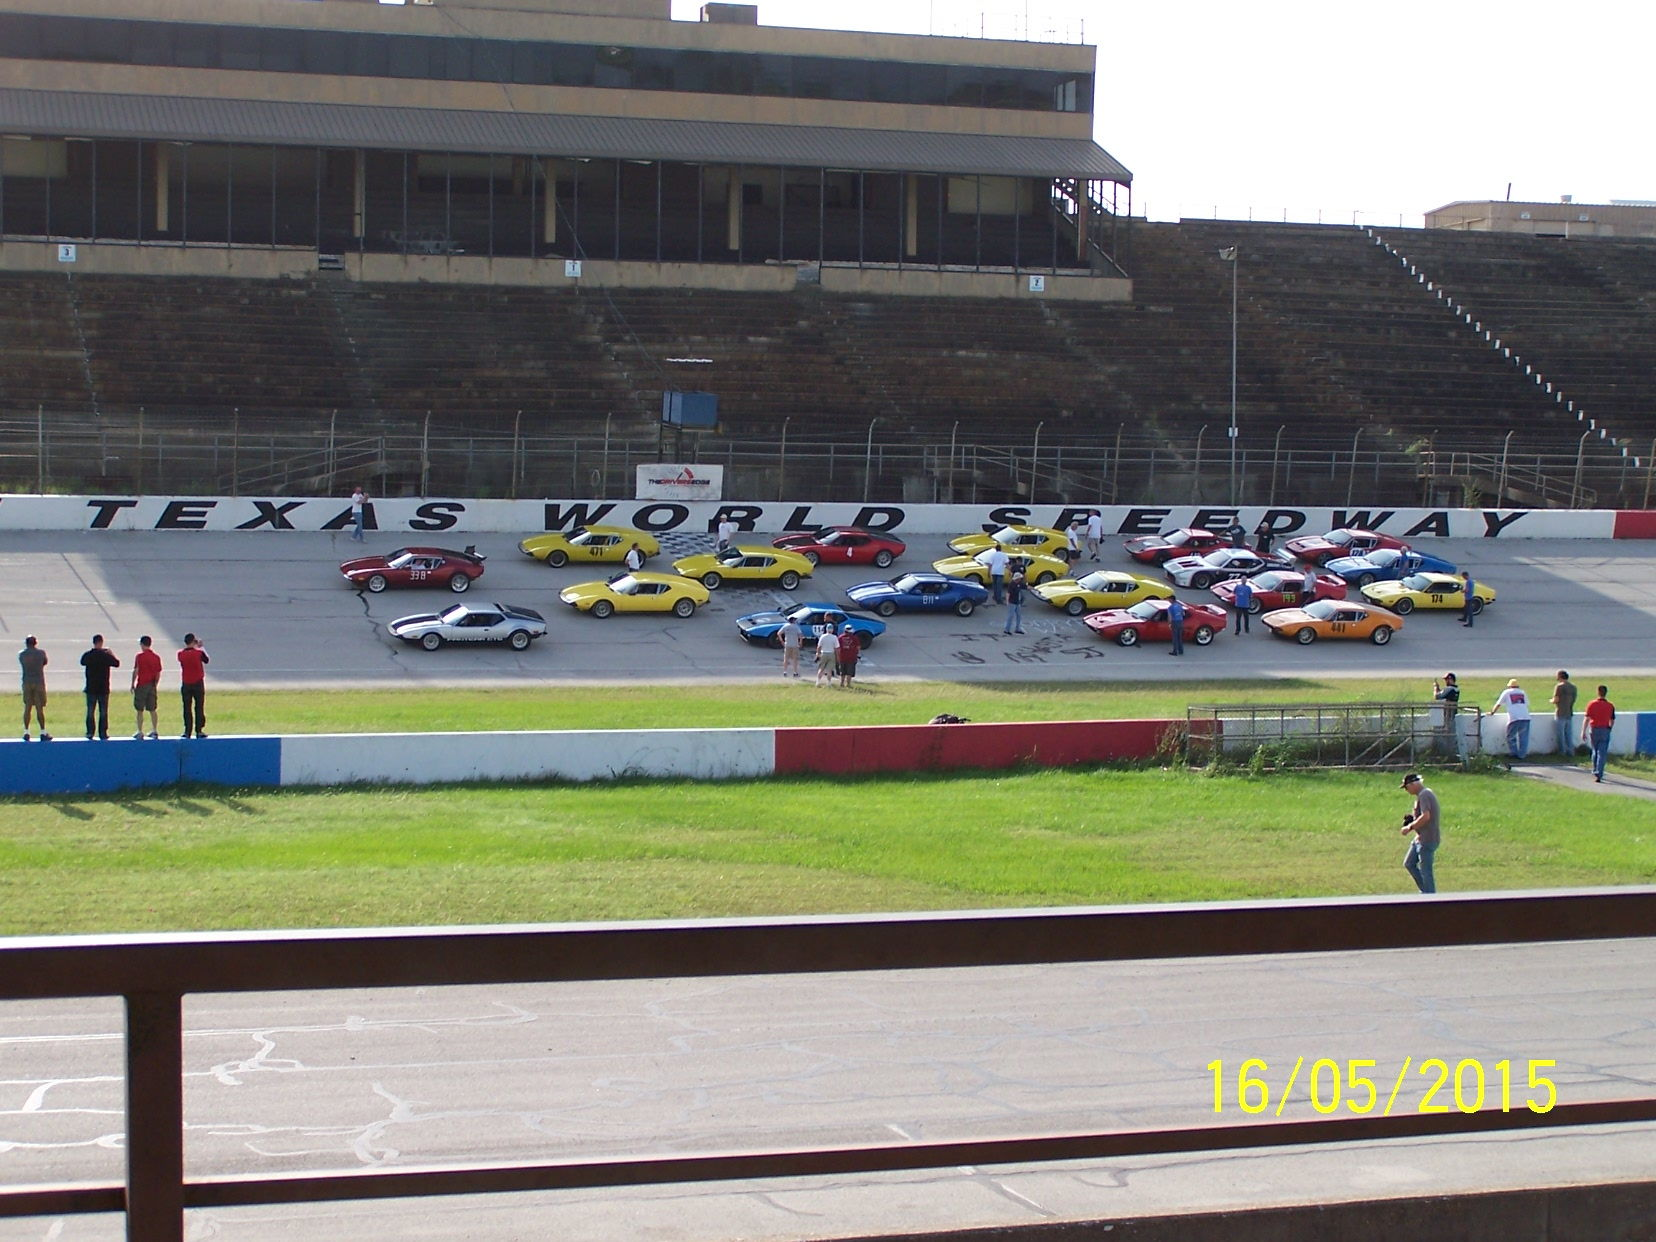 Lone Star Chevrolet Houston Tx >> Goodbye Texas World Speedway - CorvetteForum - Chevrolet Corvette Forum Discussion